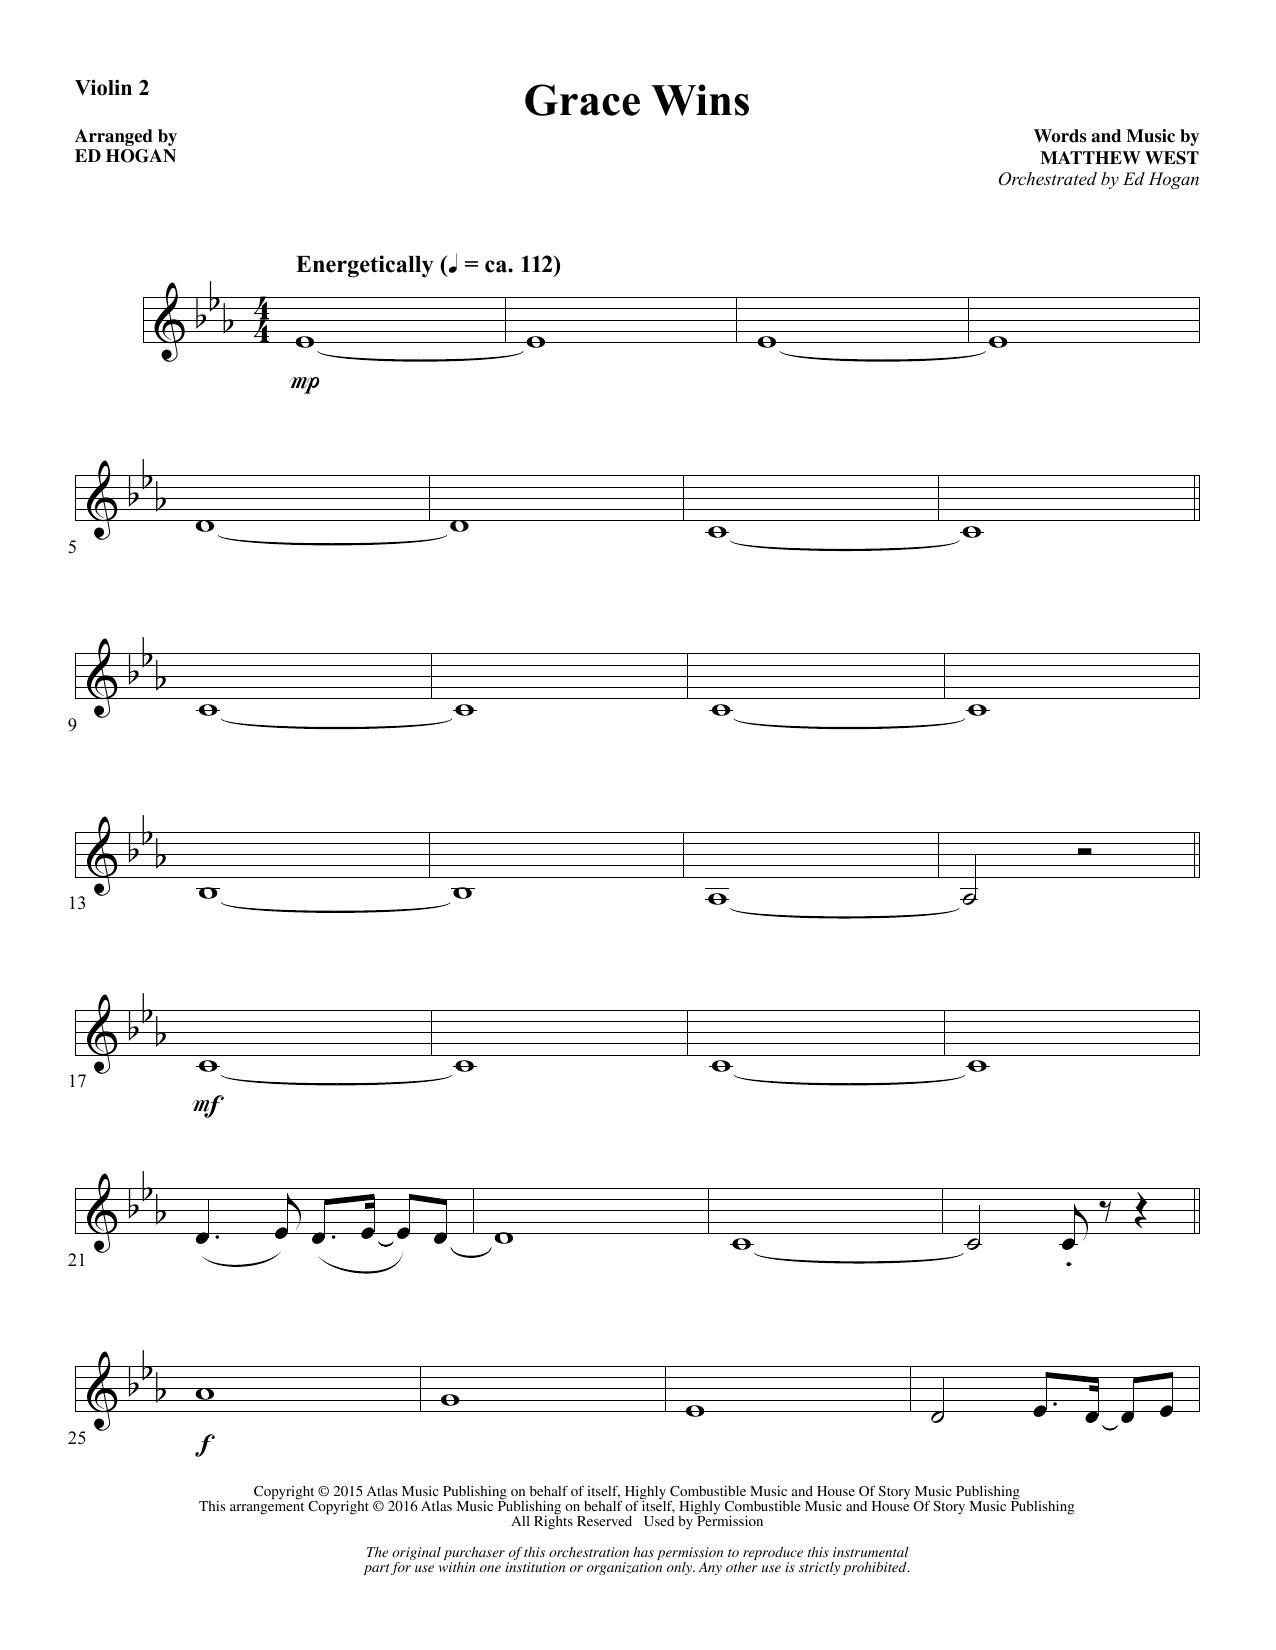 Grace Wins - Violin 2 Sheet Music